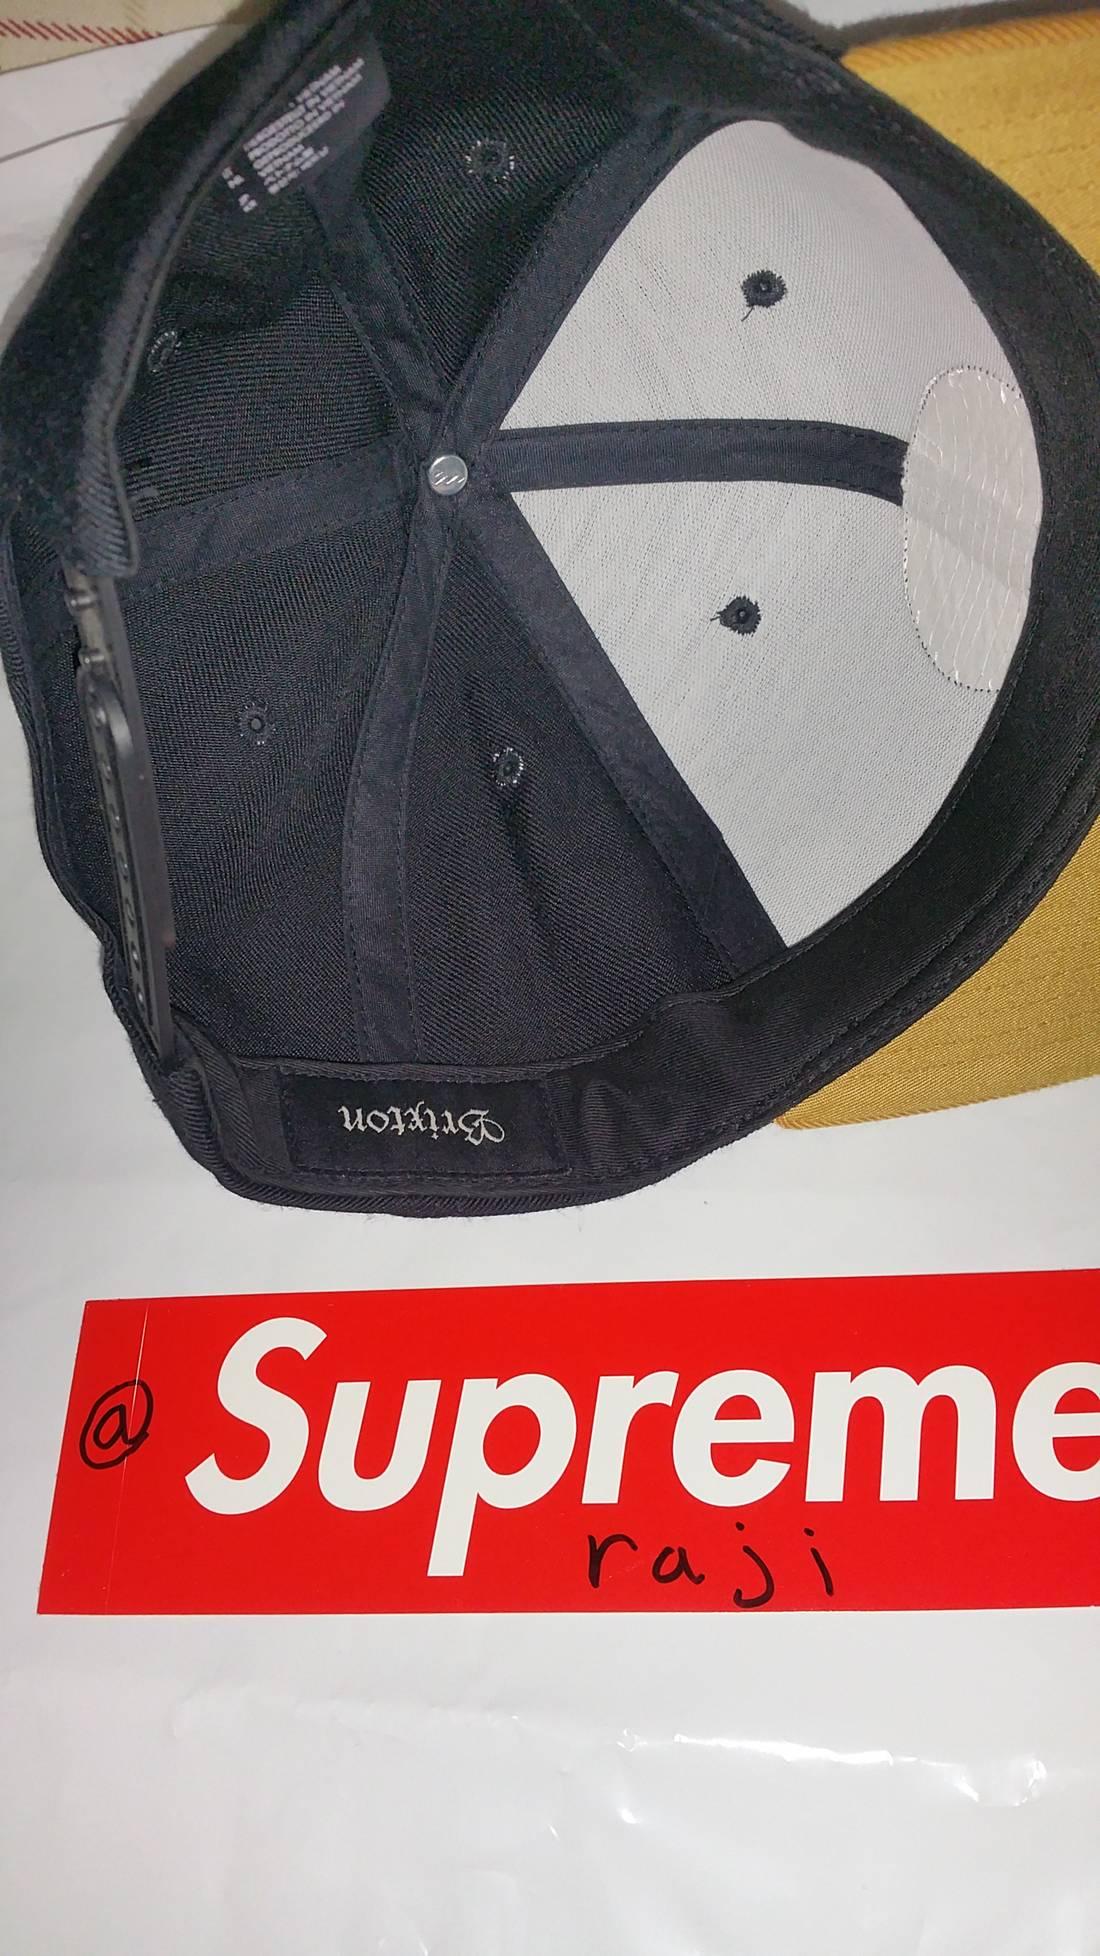 reputable site 71b95 8d318 ... australia brixton brixton supply co snapback hat size one size 2 97f59  3c3c4